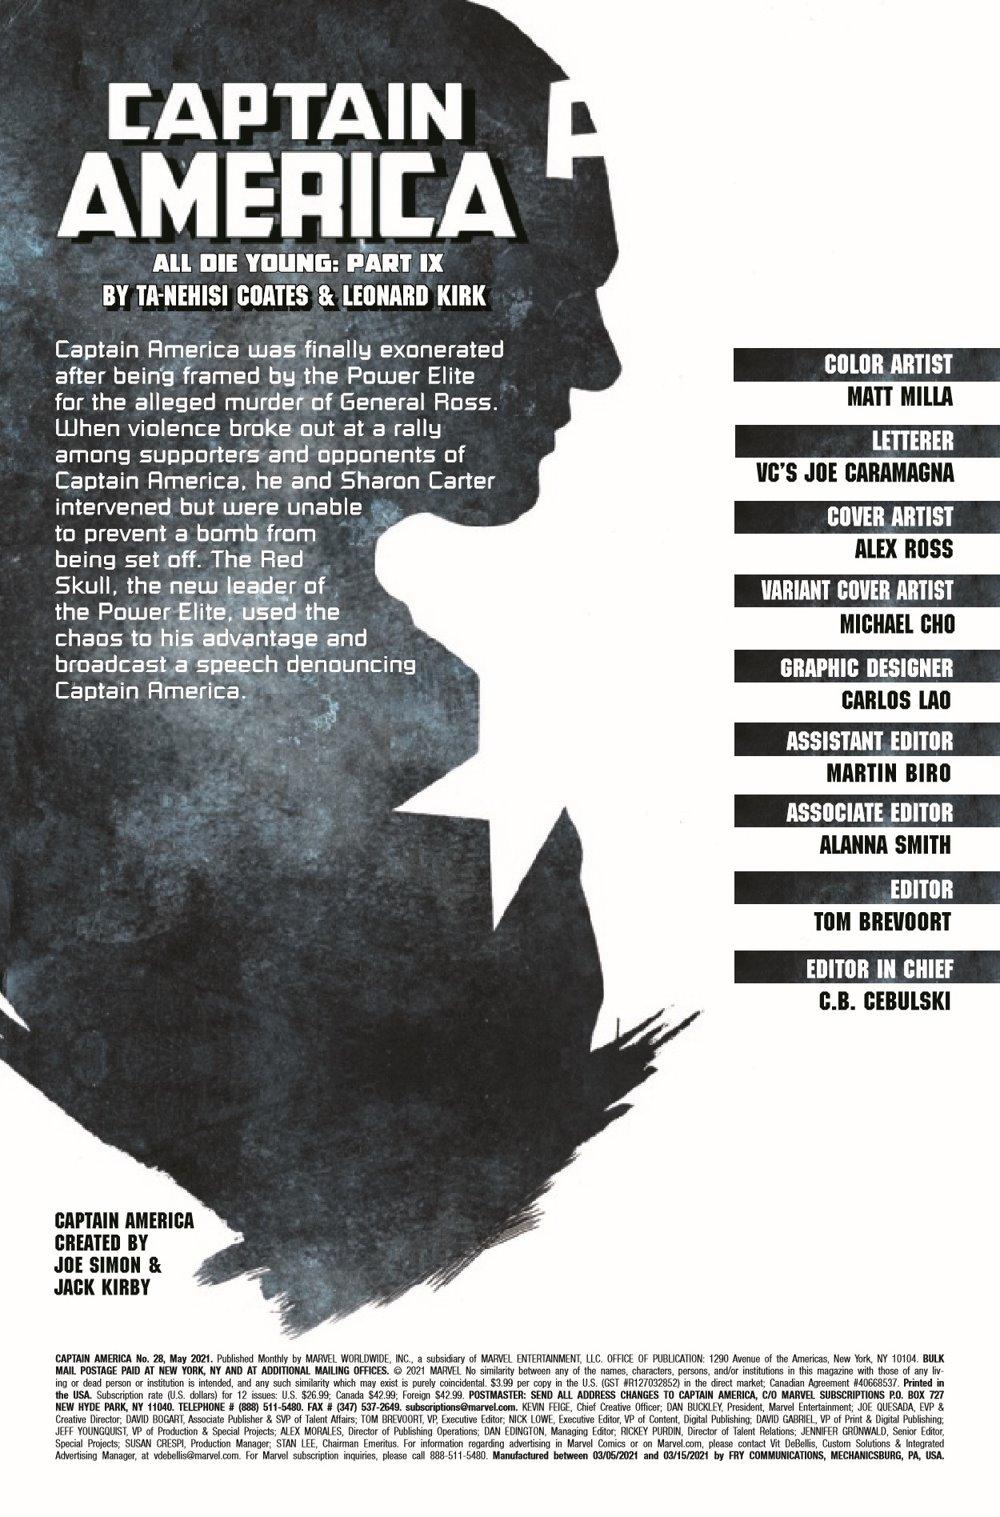 CAPA2018028_Preview-2 ComicList Previews: CAPTAIN AMERICA #28